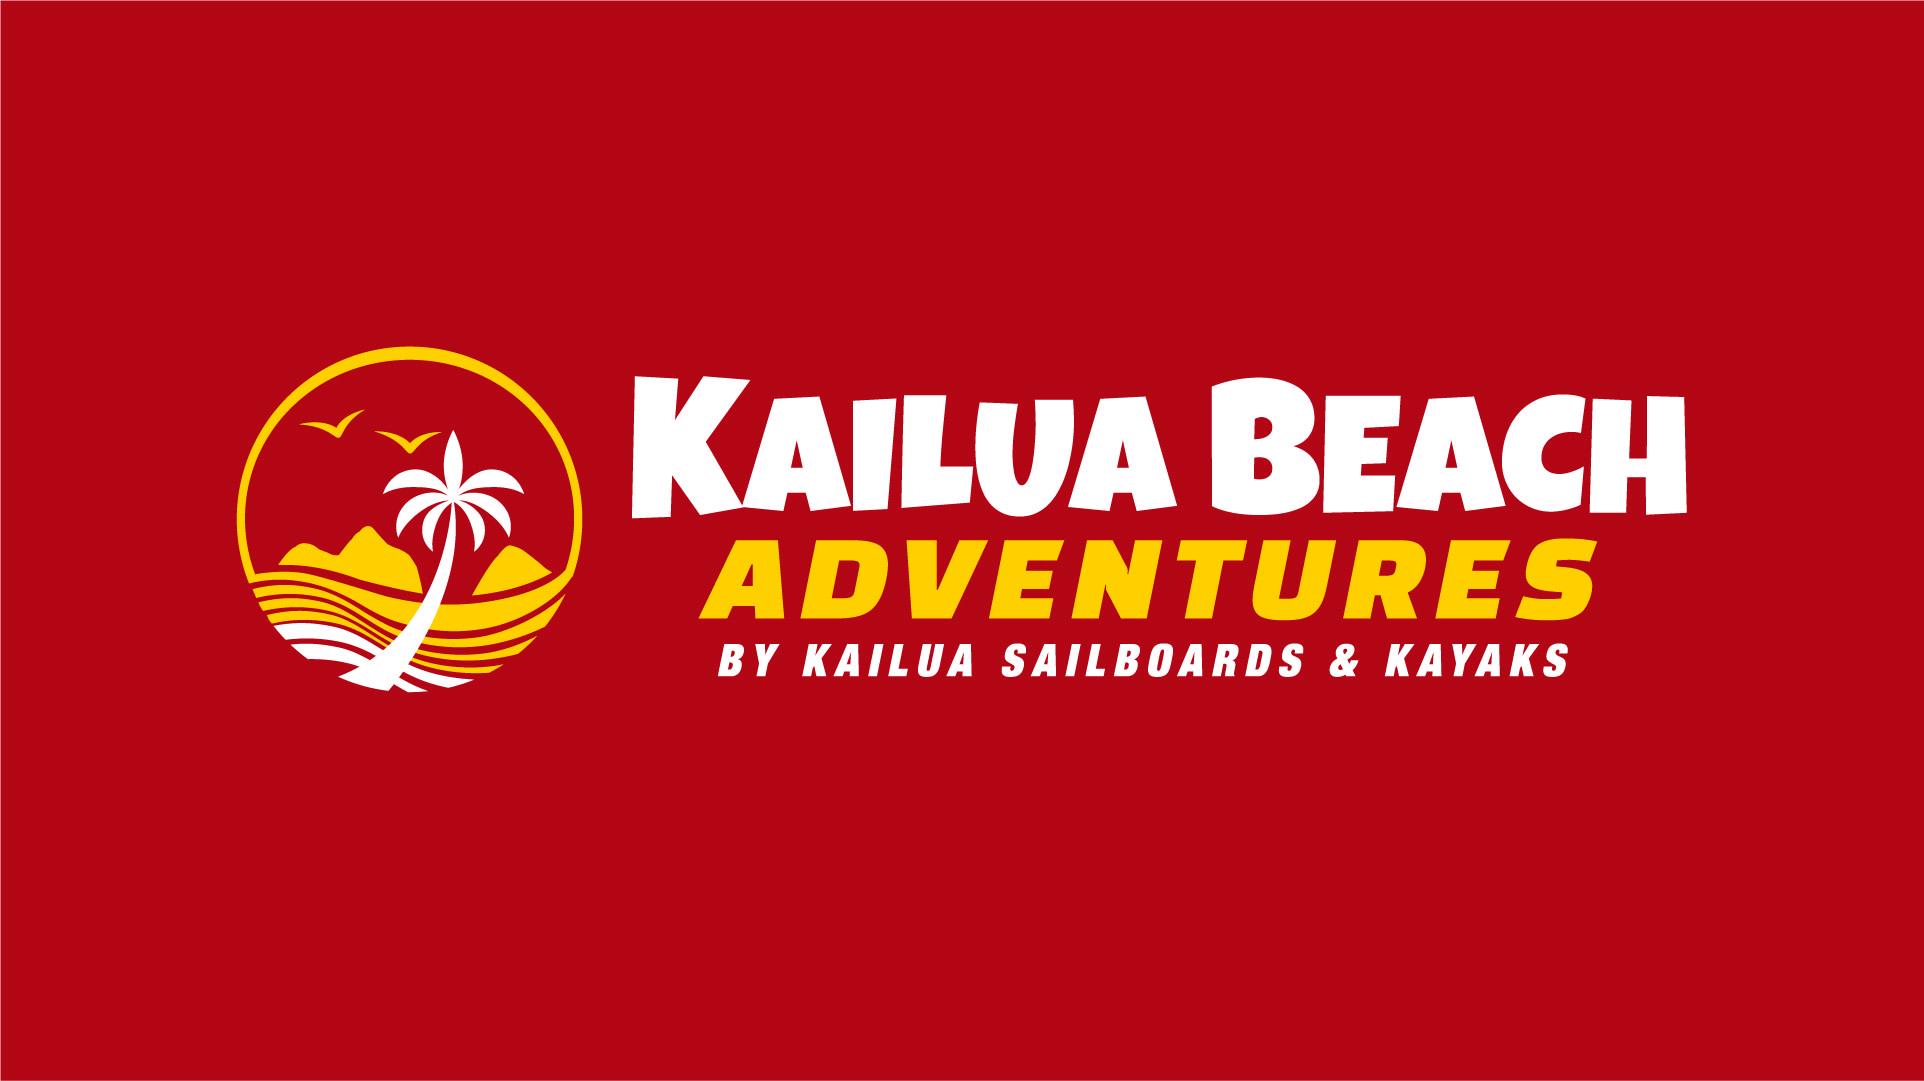 Kailua Beach Adventurs